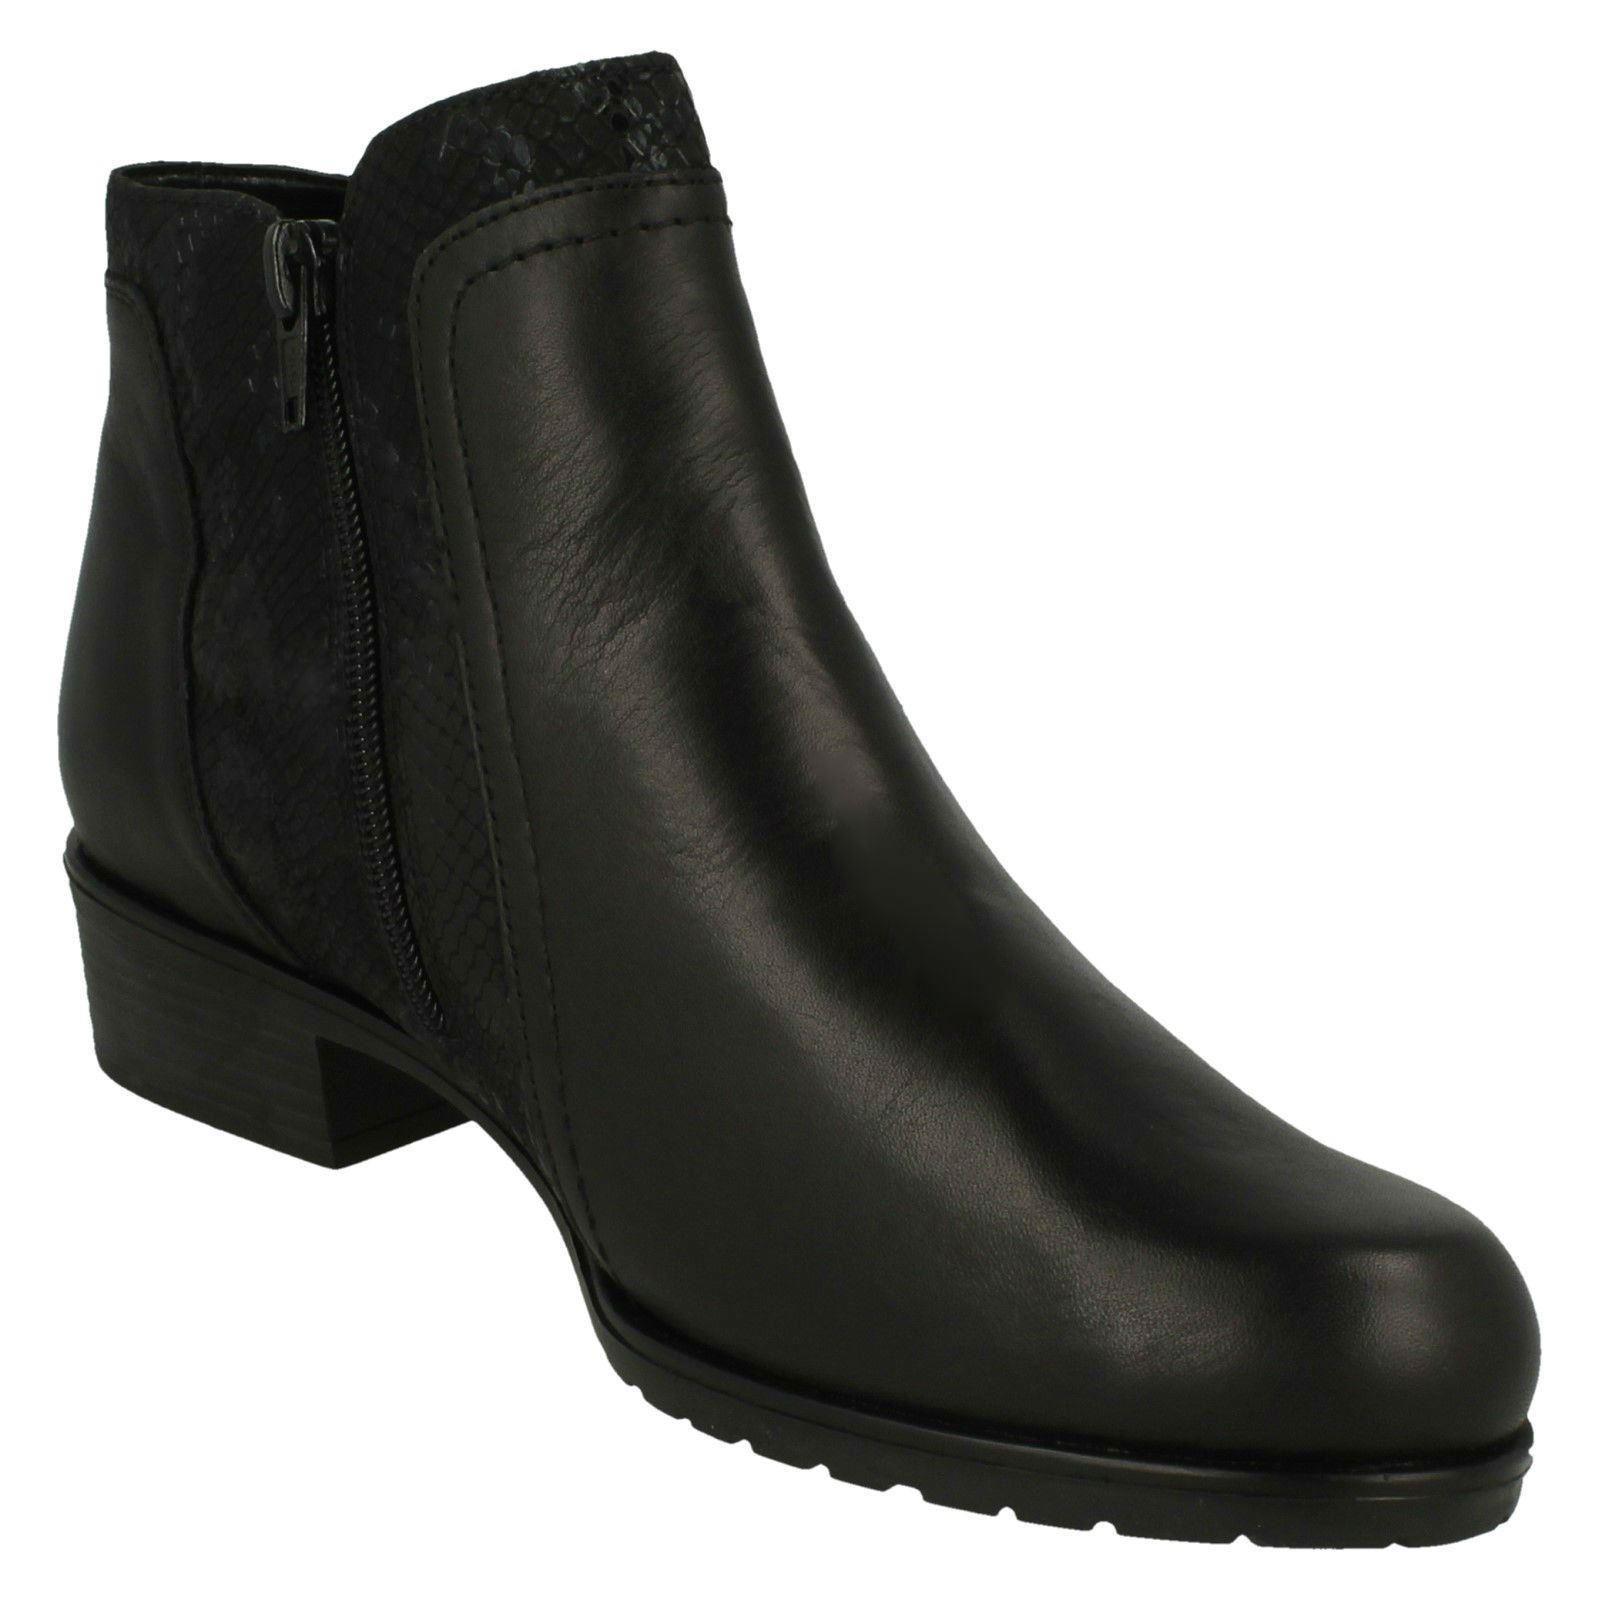 Mujer botas Cremallera-remonte al Tobillo Cremallera-remonte botas D6870 433e24